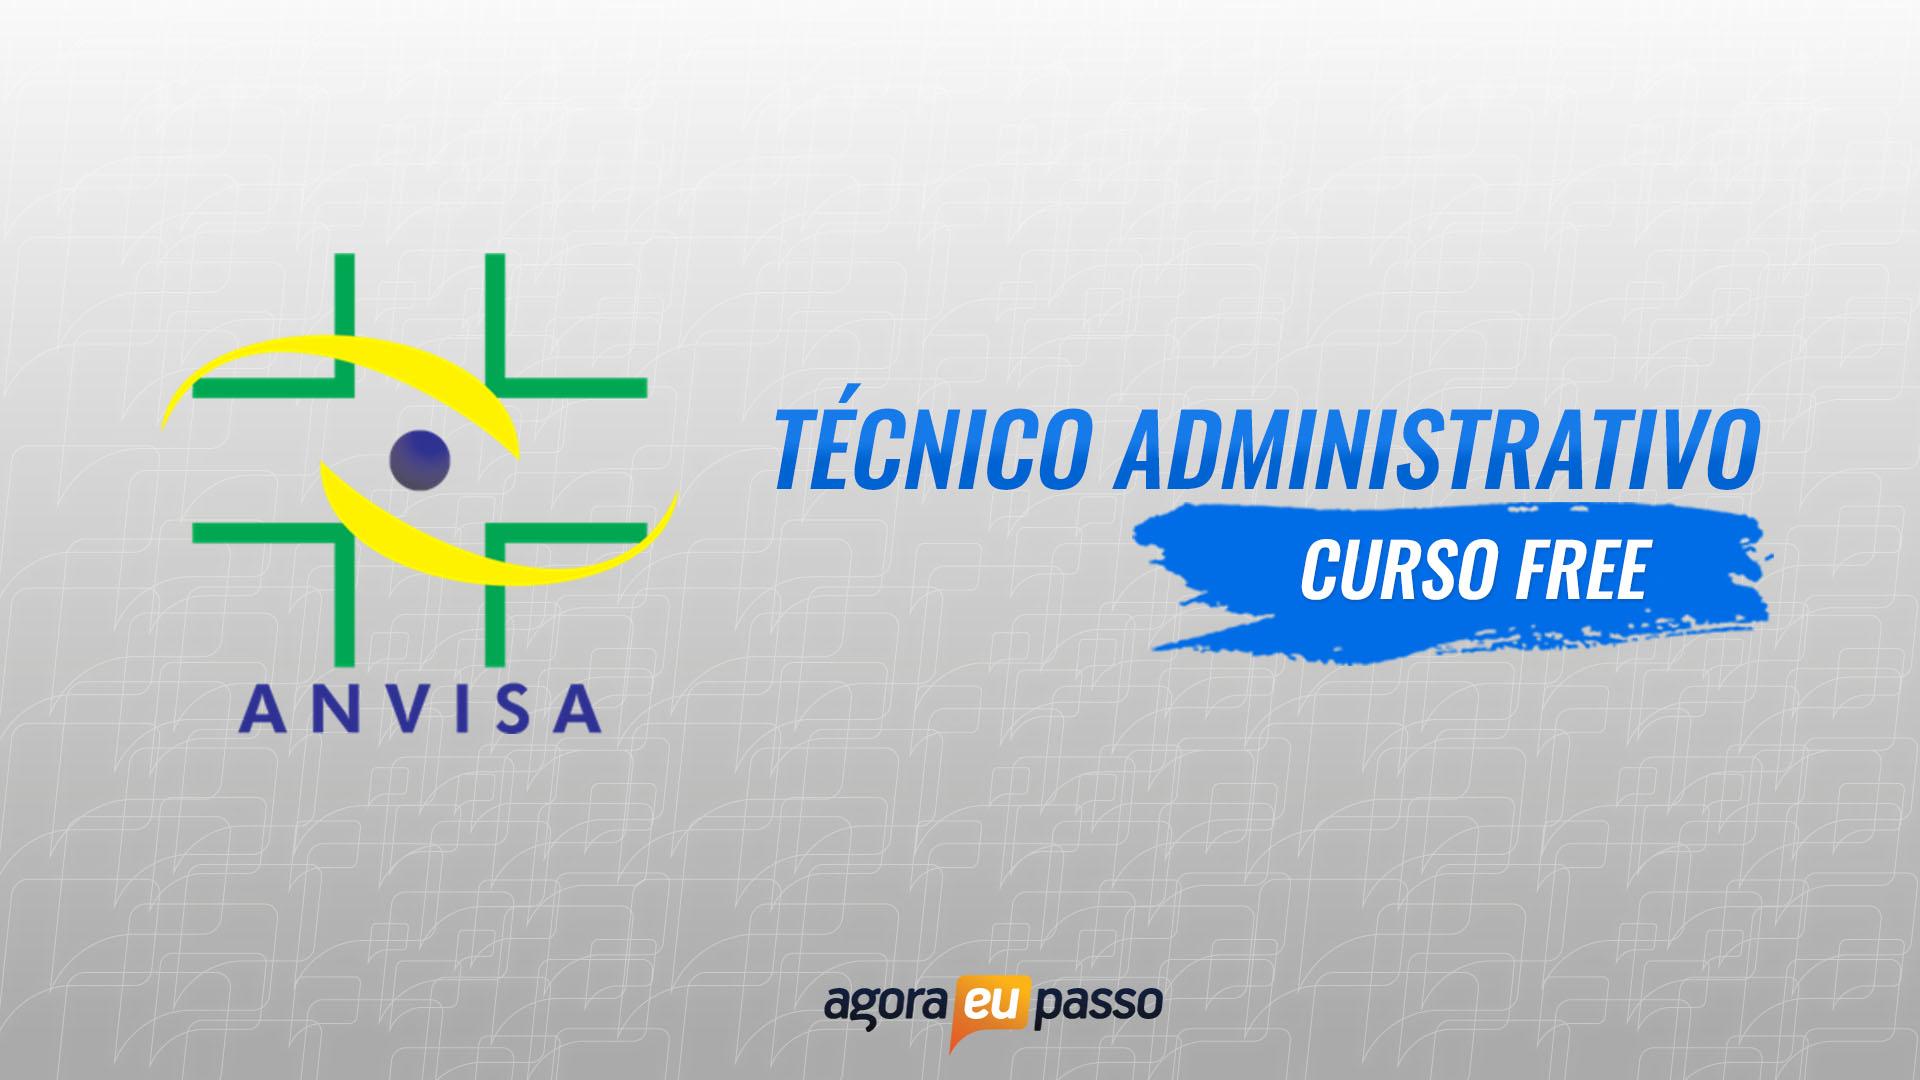 ANVISA - CURSO FREE - TÉCNICO ADMINISTRATIVO